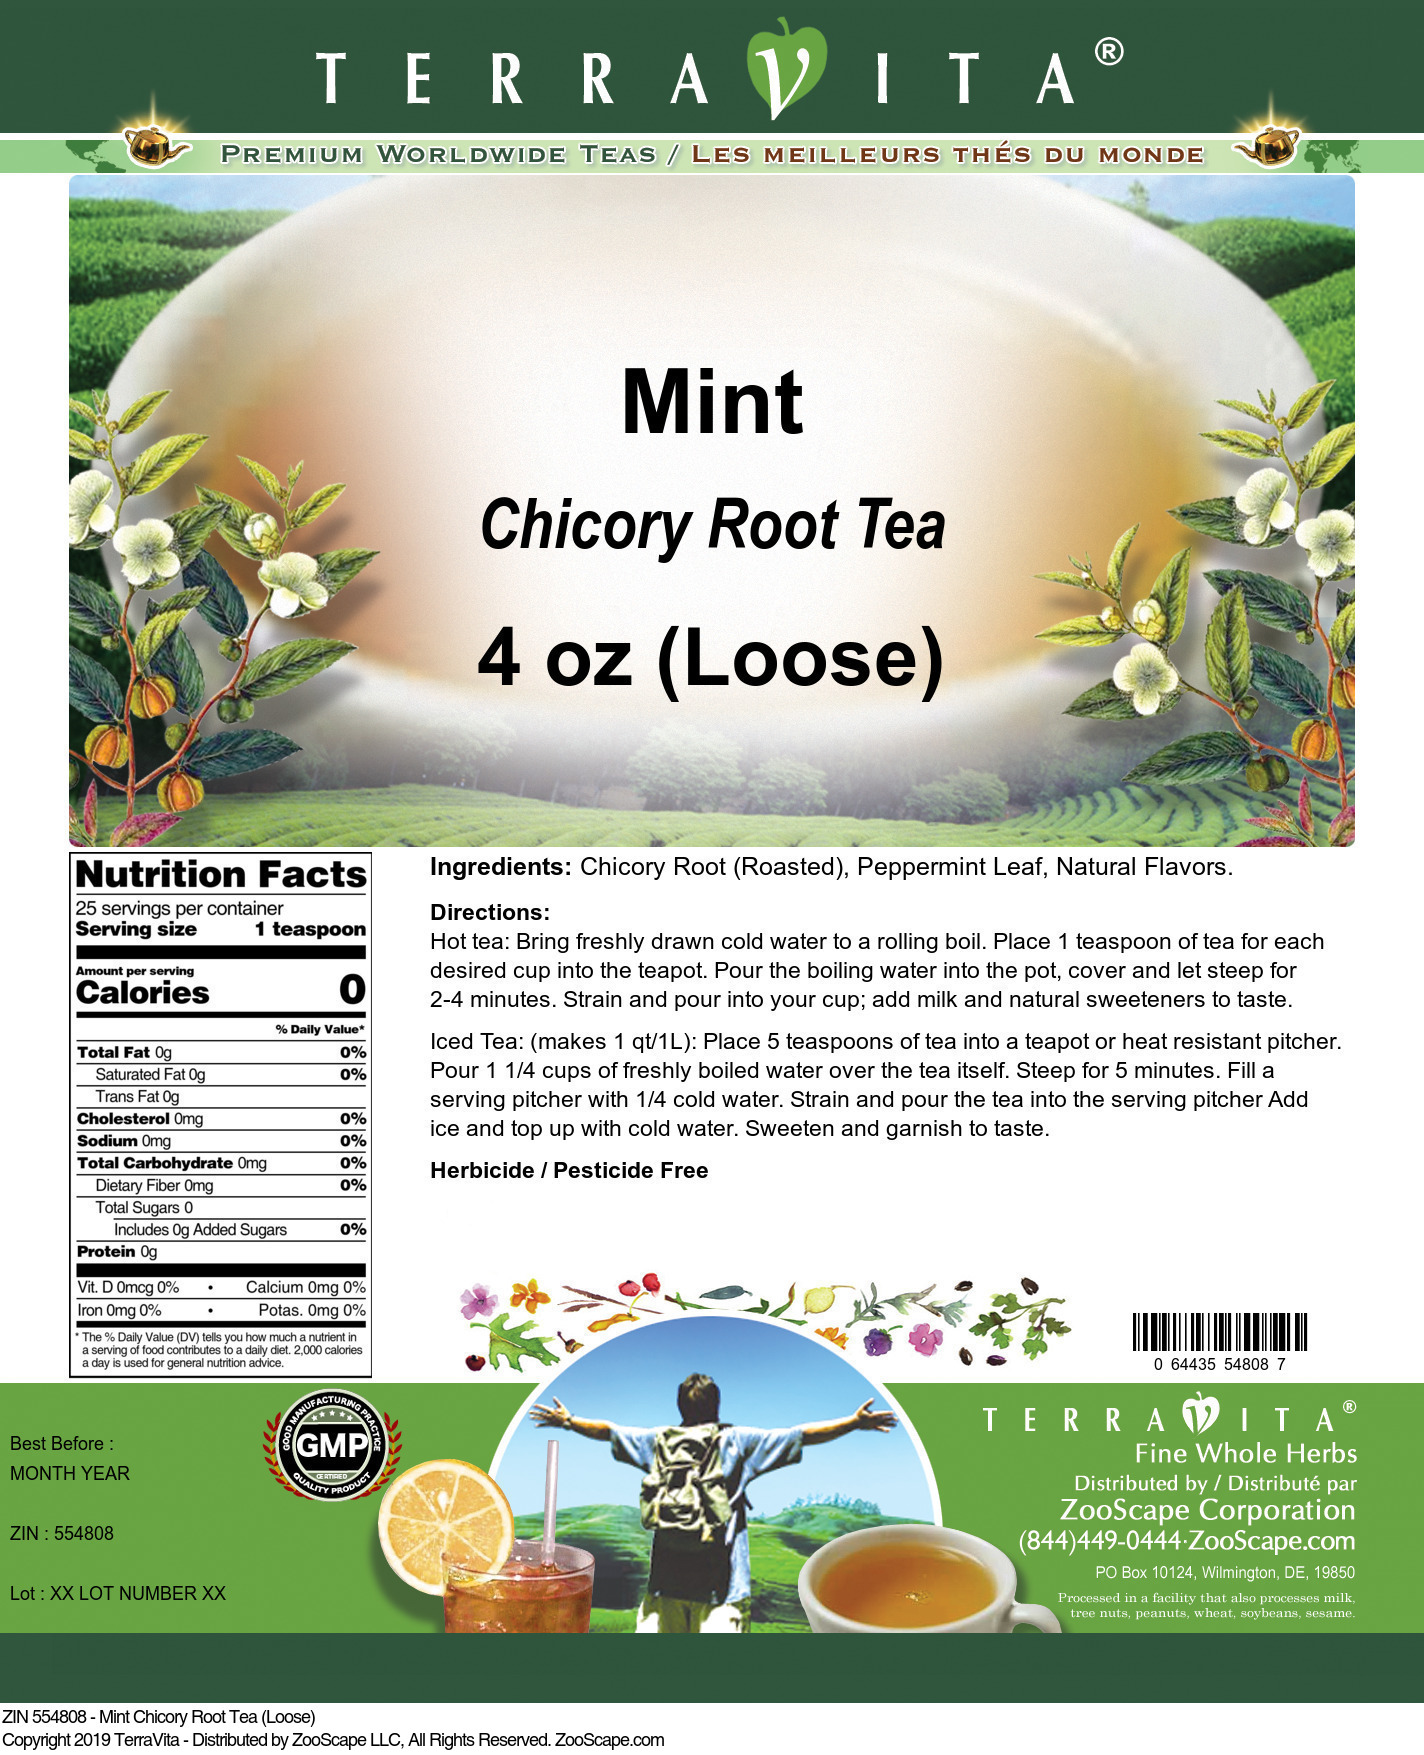 Mint Chicory Root Tea (Loose)